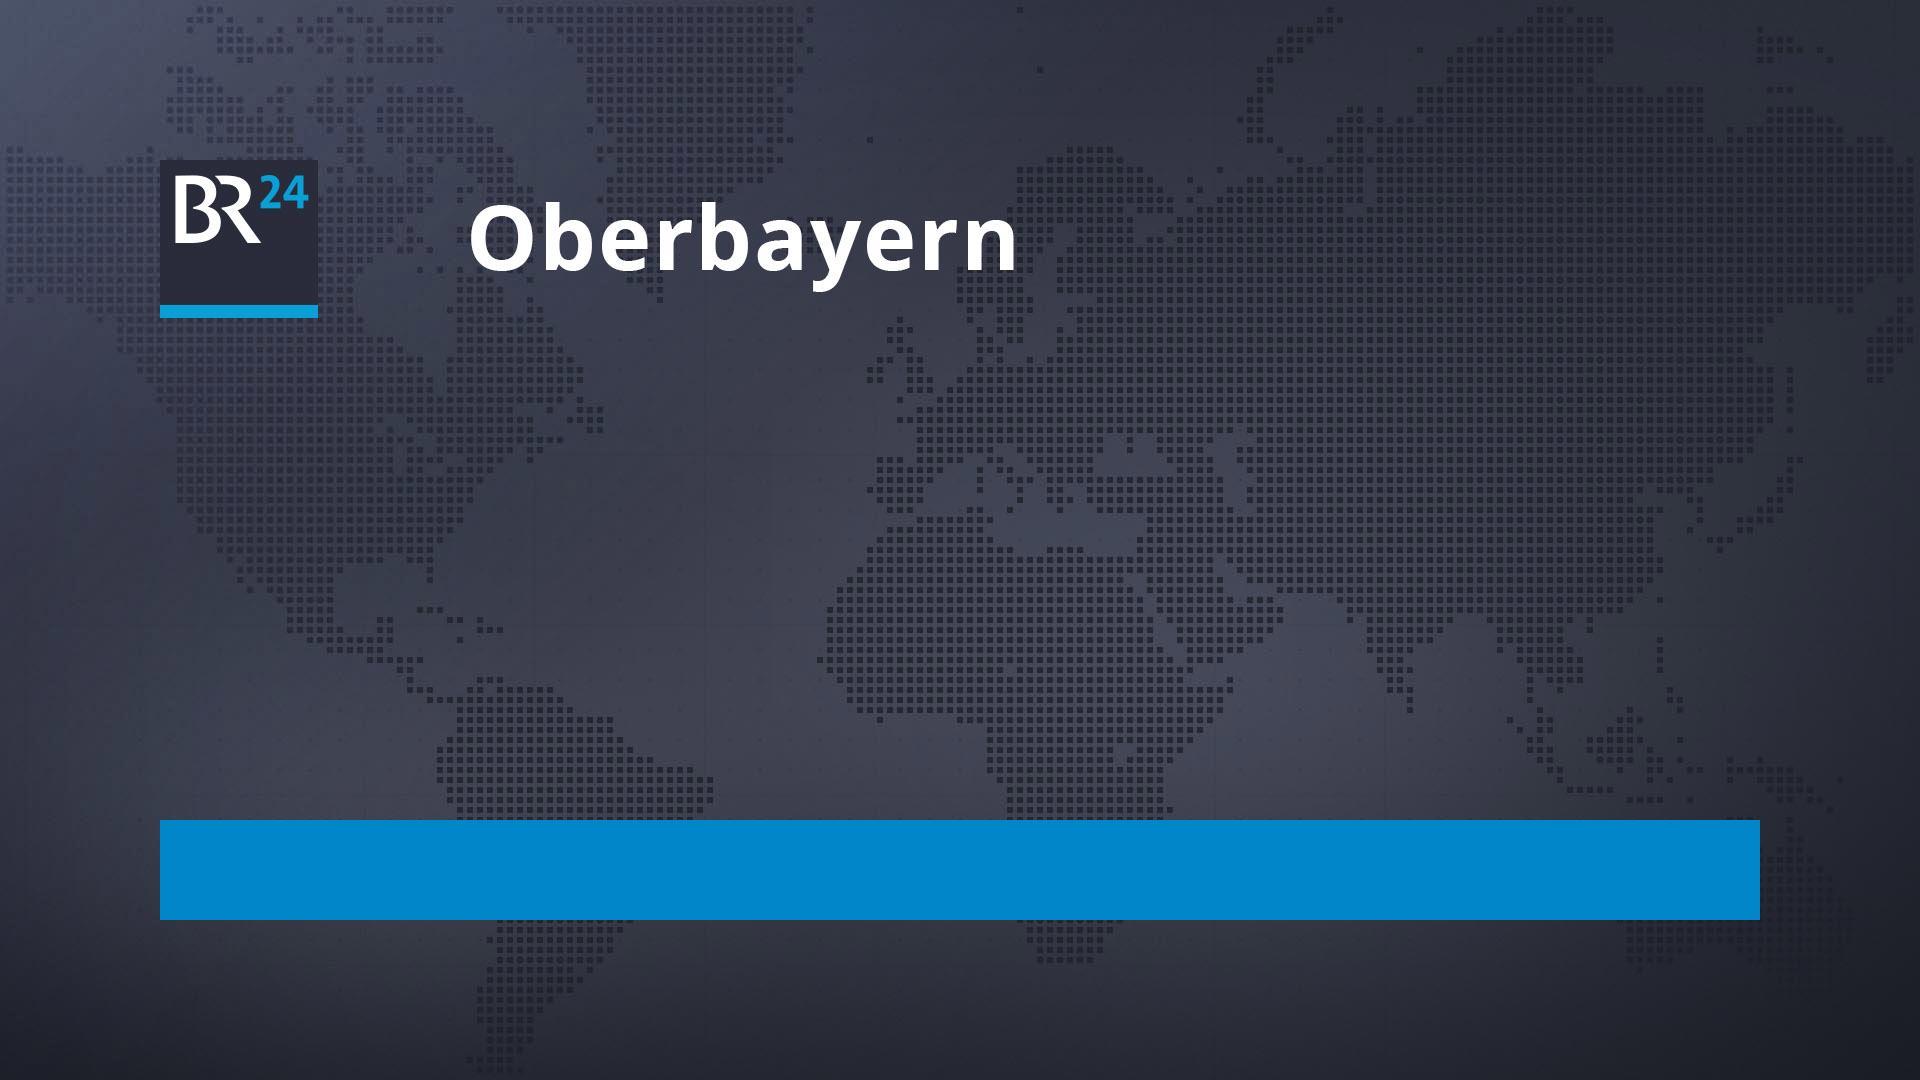 Symbolbild BR24 Oberbayern